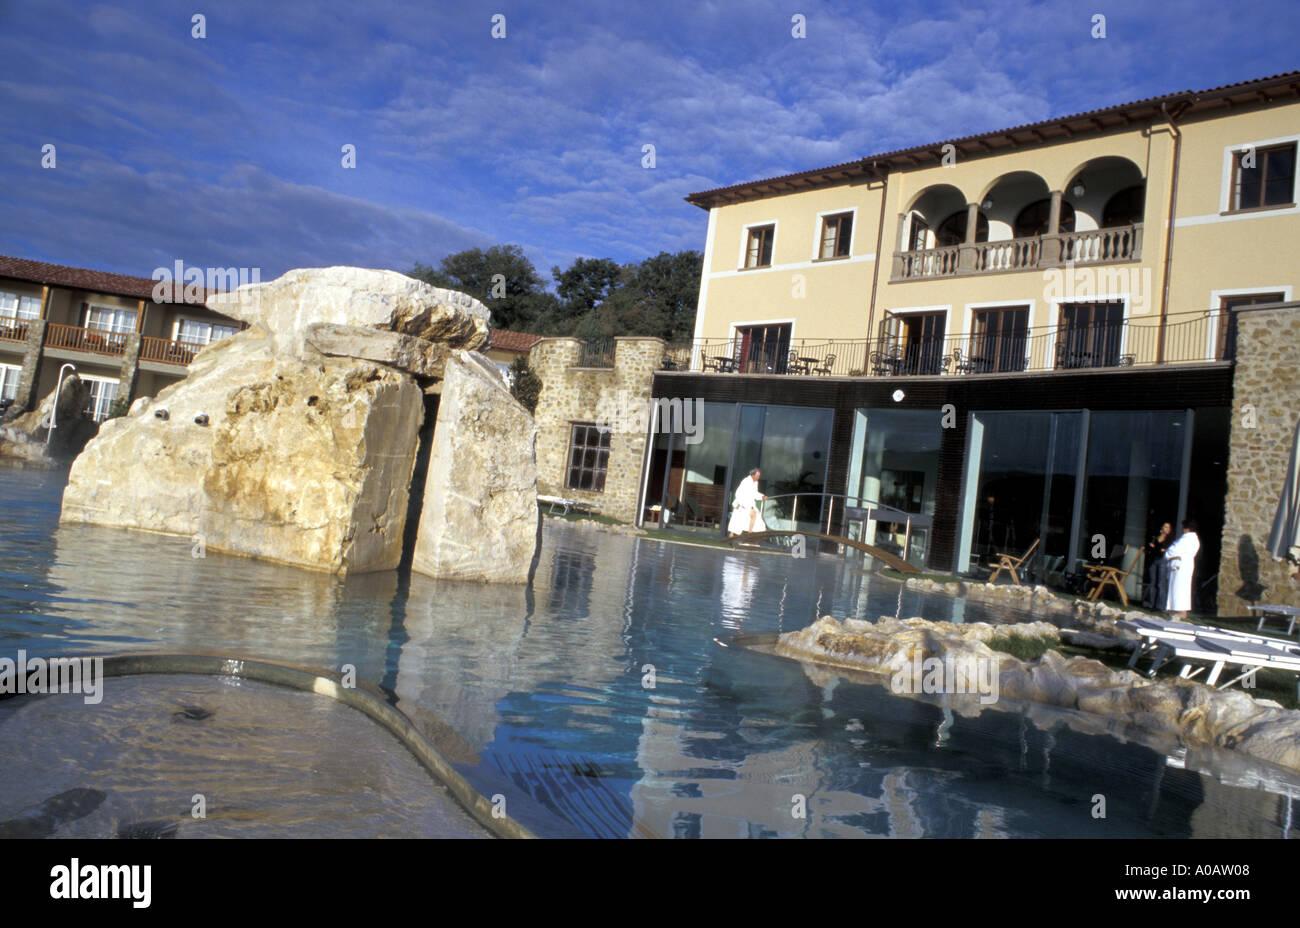 Hotel Adler Thermae Bagno Vignoni Tuscany Italy Stock Photo ...